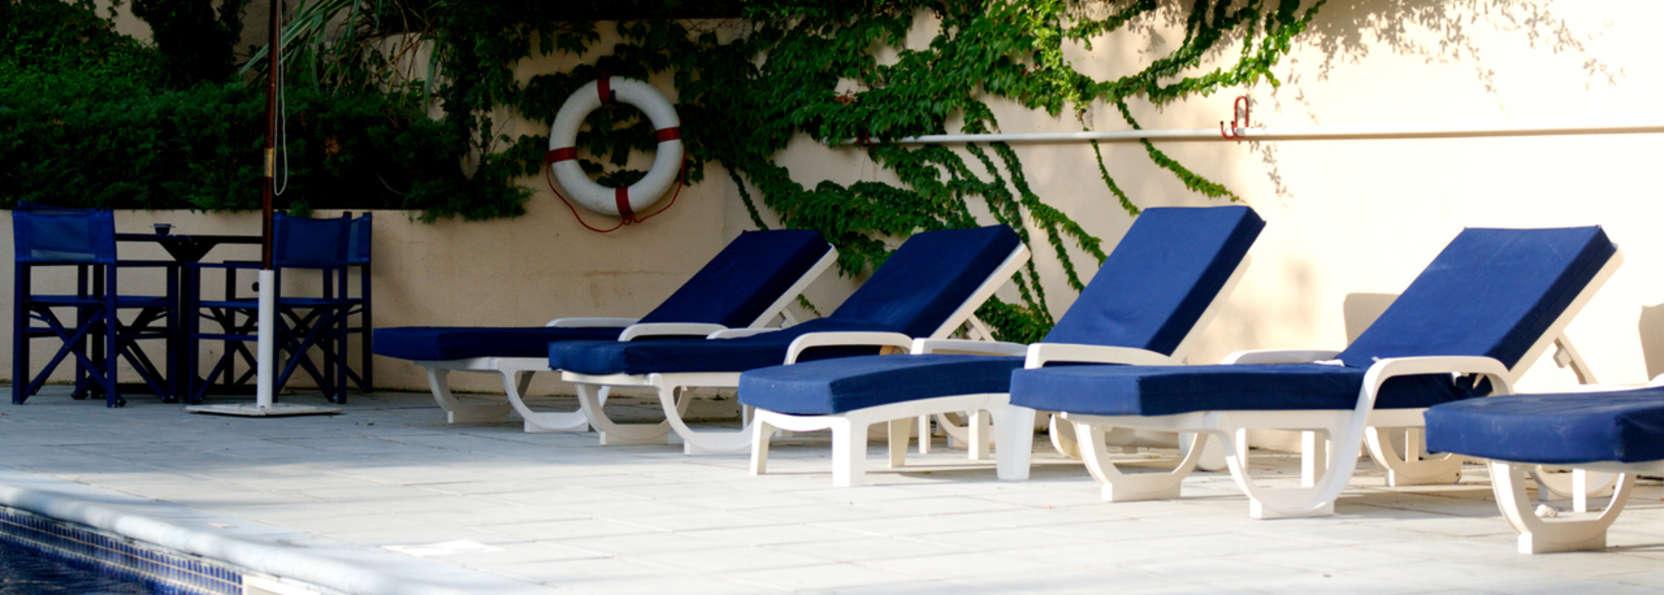 Week end en ville marseille partir de 10 for Hotel piscine interieure paca